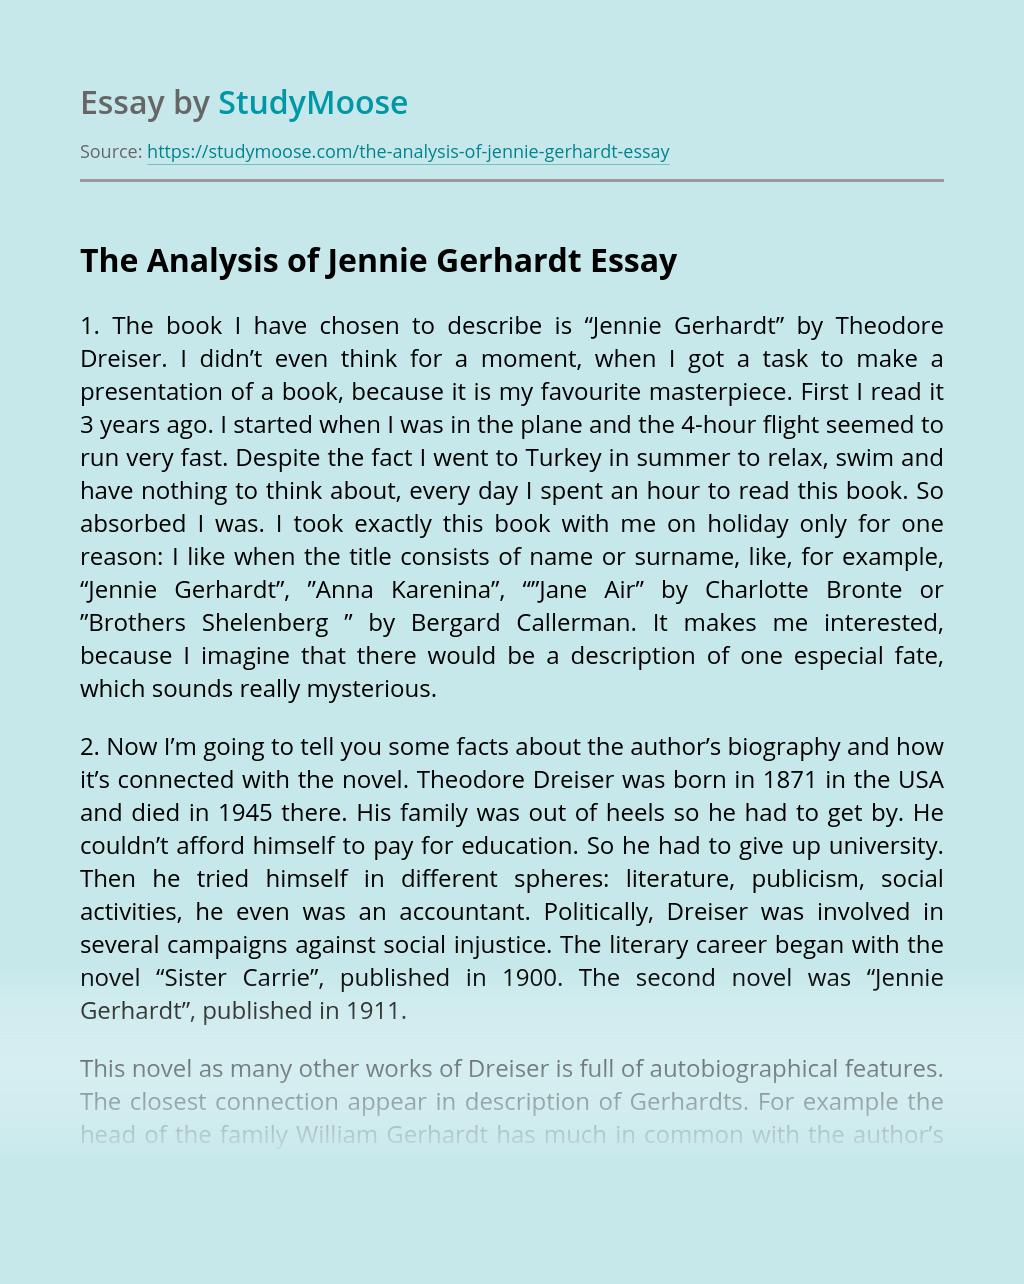 The Analysis of Jennie Gerhardt by Theodore Dreiser